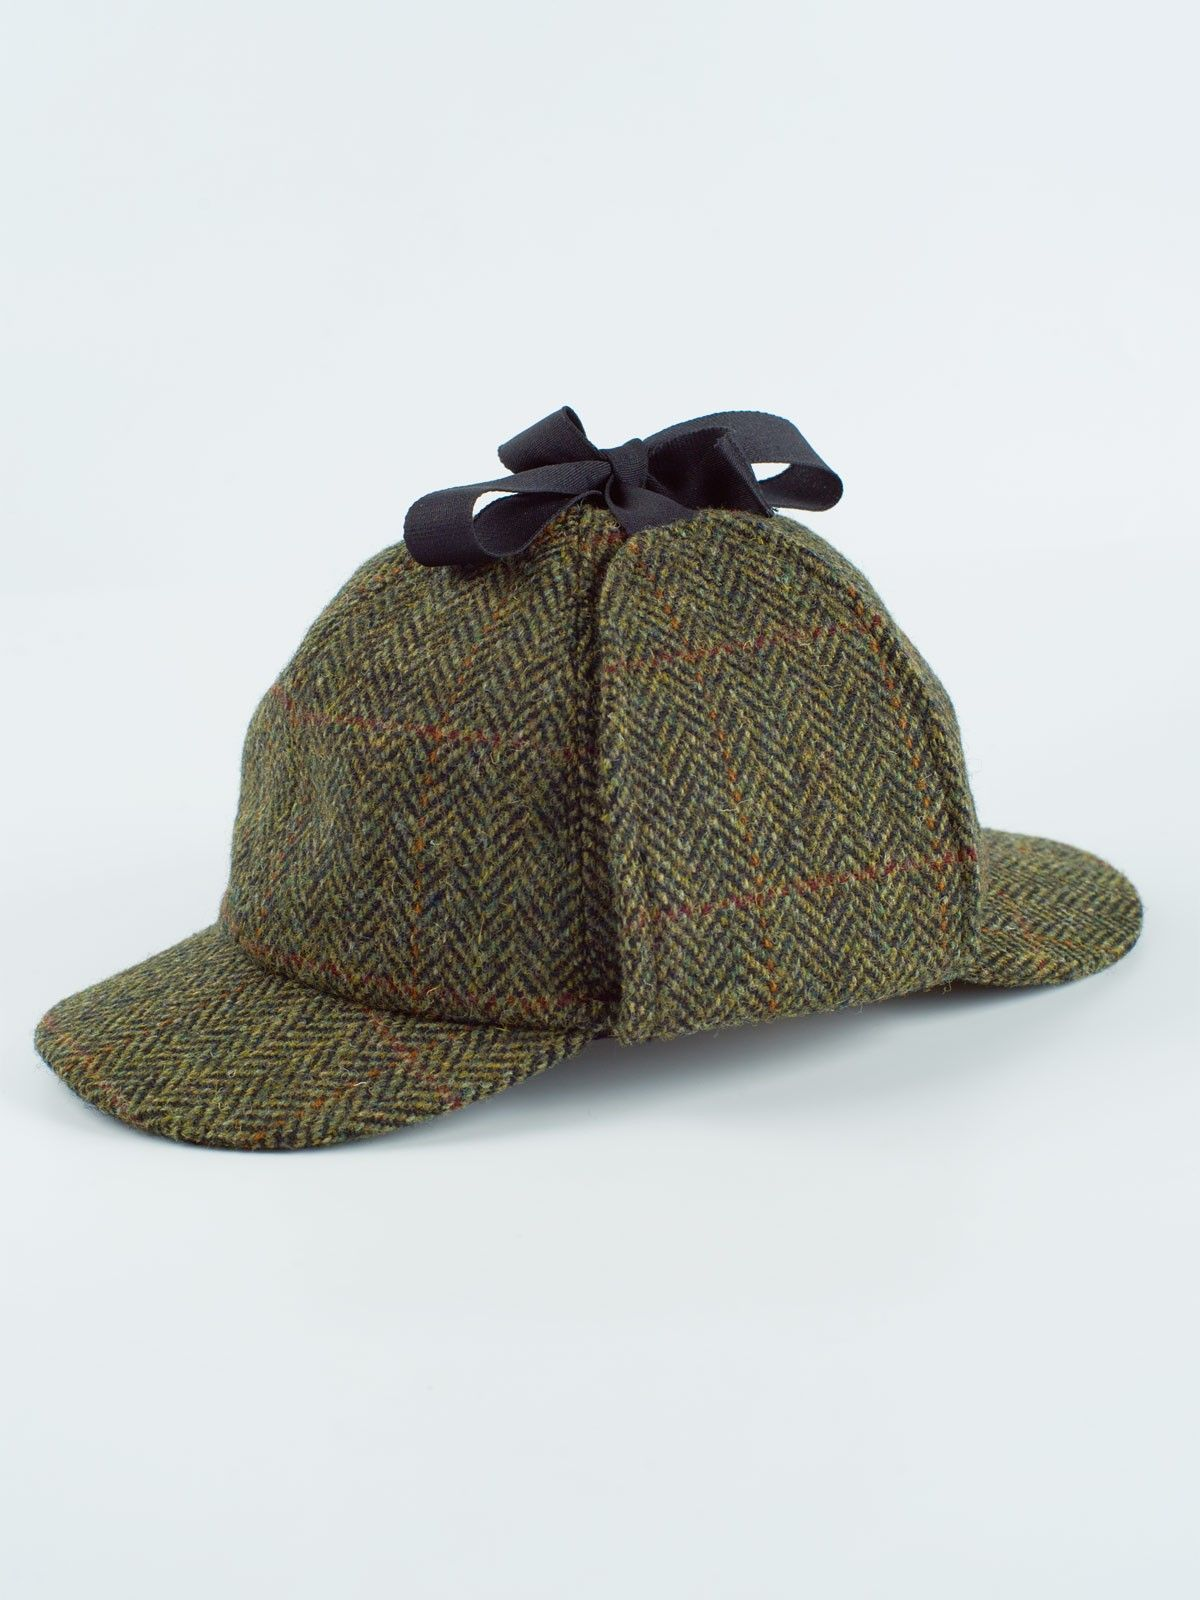 78cb0283ba1 Harris Tweed Deerstalker - dress in Sherlock style